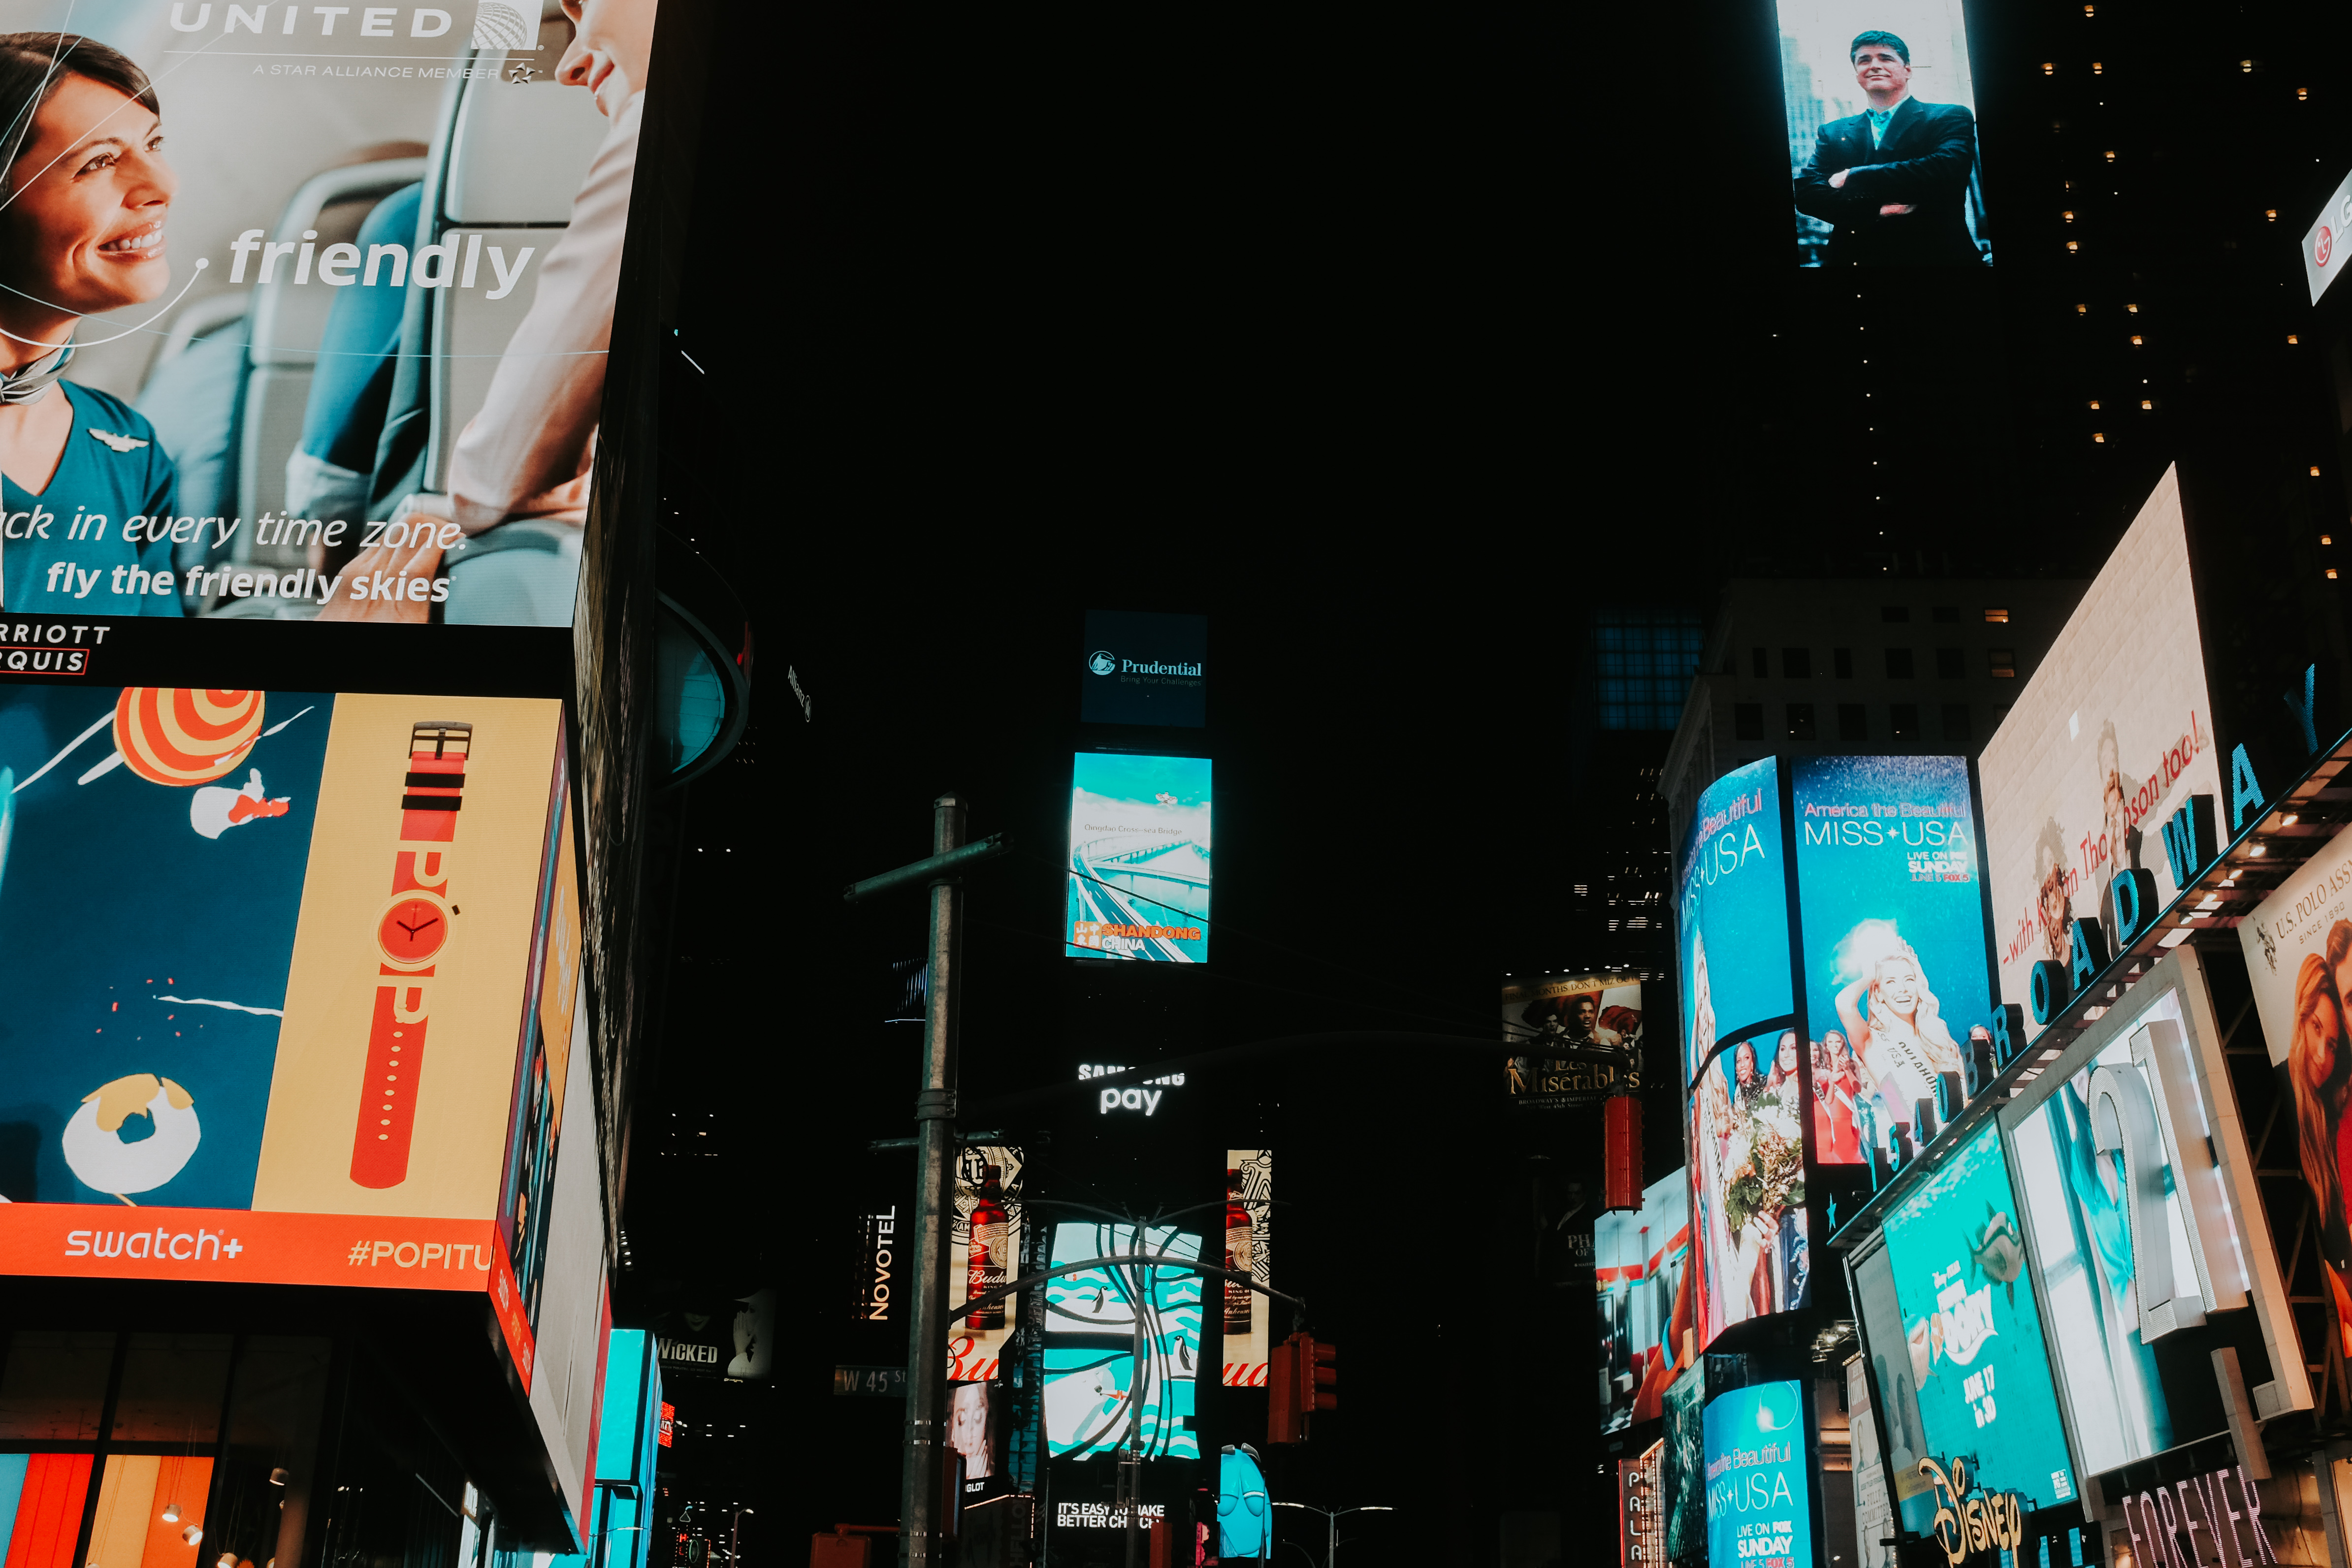 newyork-melissamilis-134